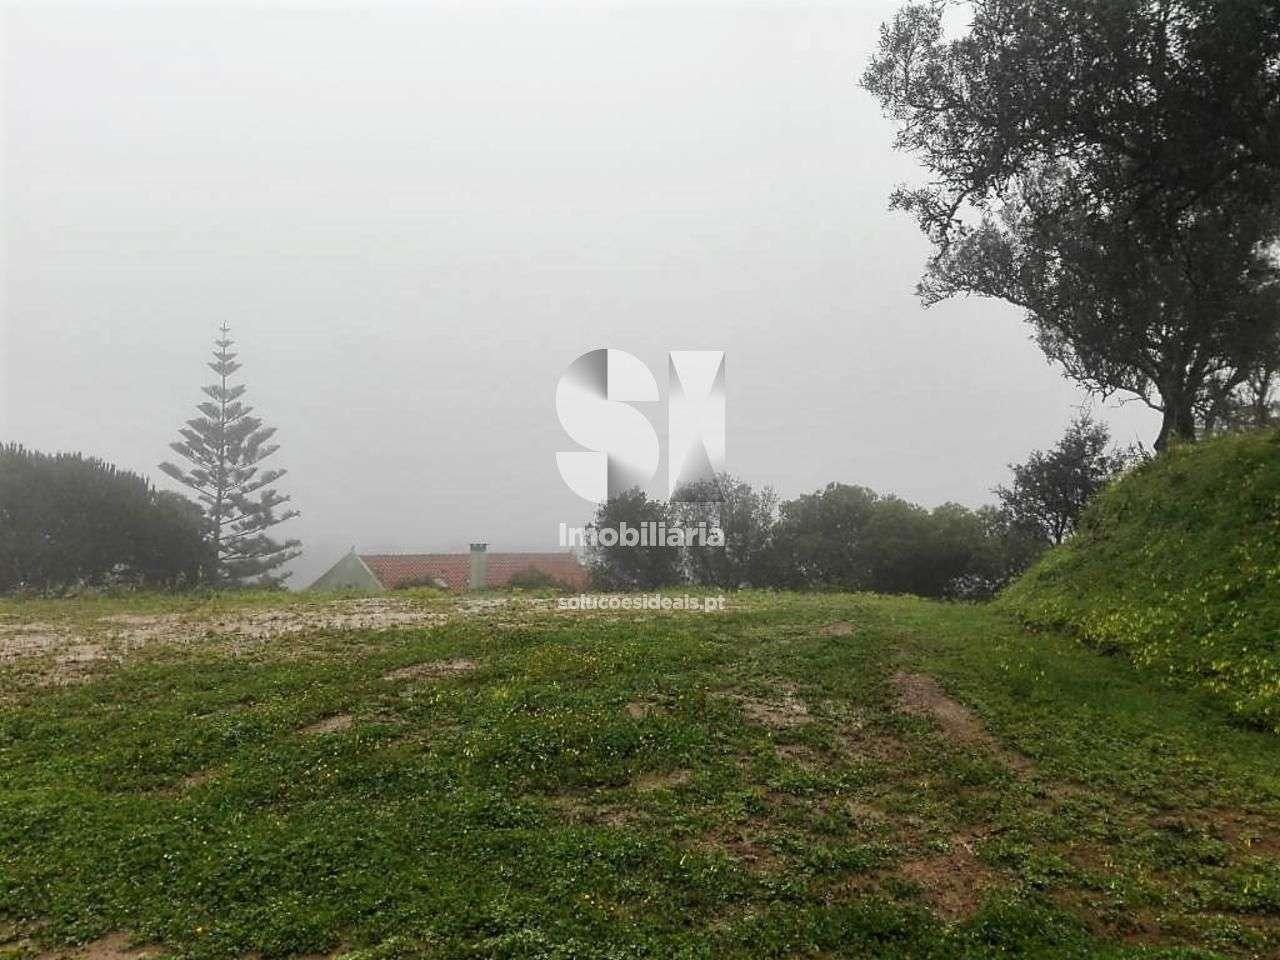 Terreno para comprar, Roliça, Bombarral, Leiria - Foto 1